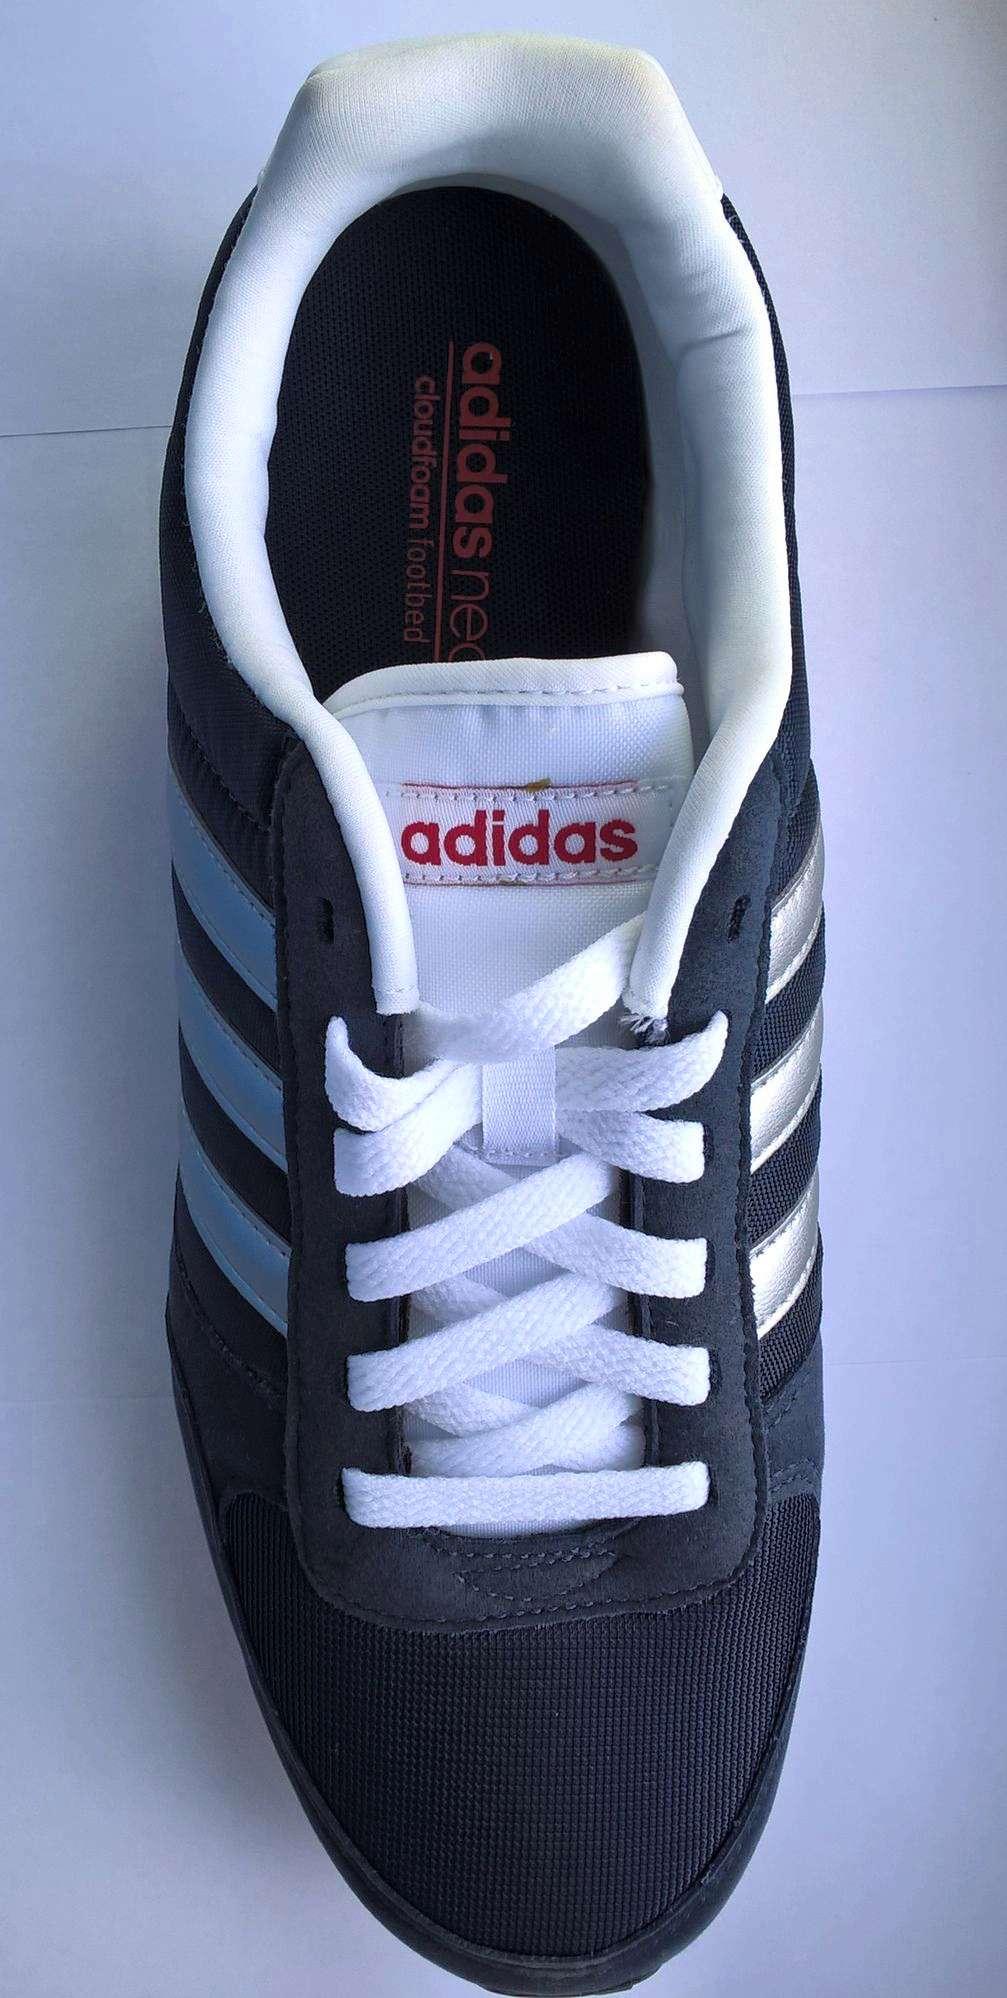 2ea9462cbf7a krossovki adidas neo city racer f99330 mugskie tsvet temno siniy rus razmer 43 1480847412 1.jpg